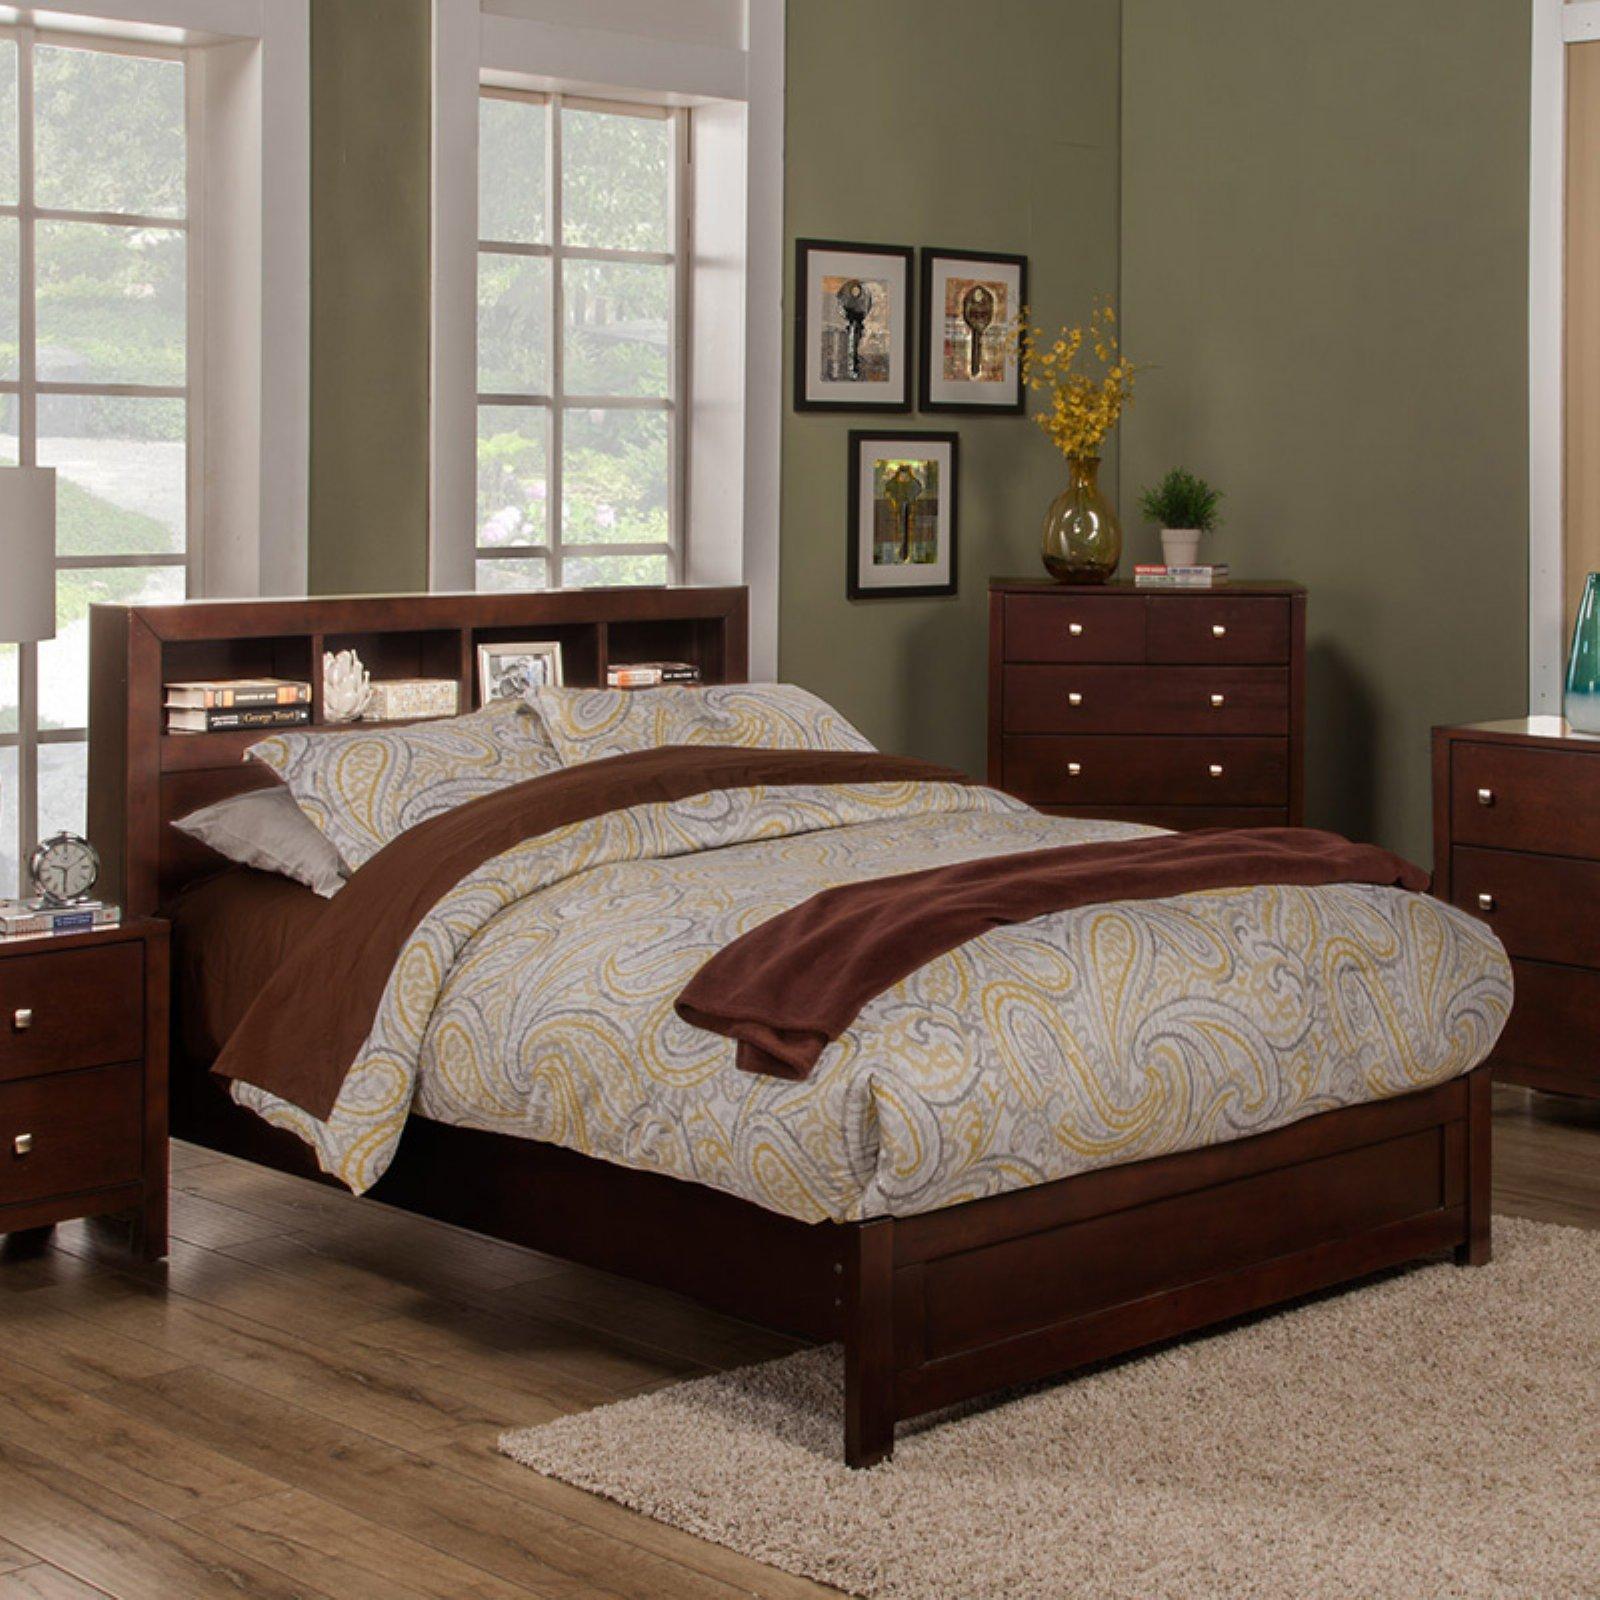 Alpine Furniture Solana Bookcase Platform Bed